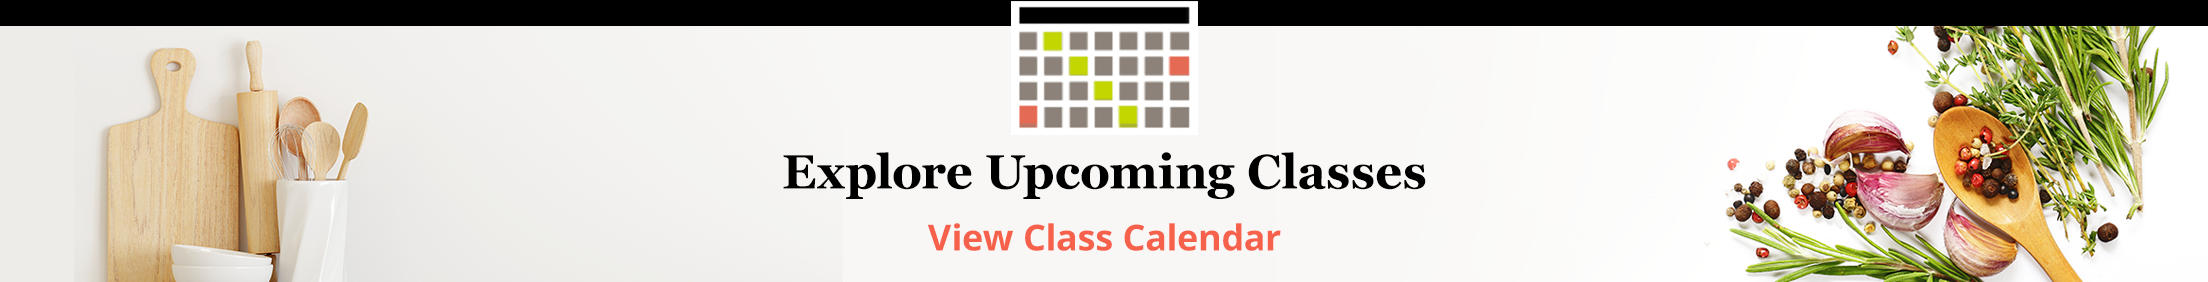 prinatable calendars